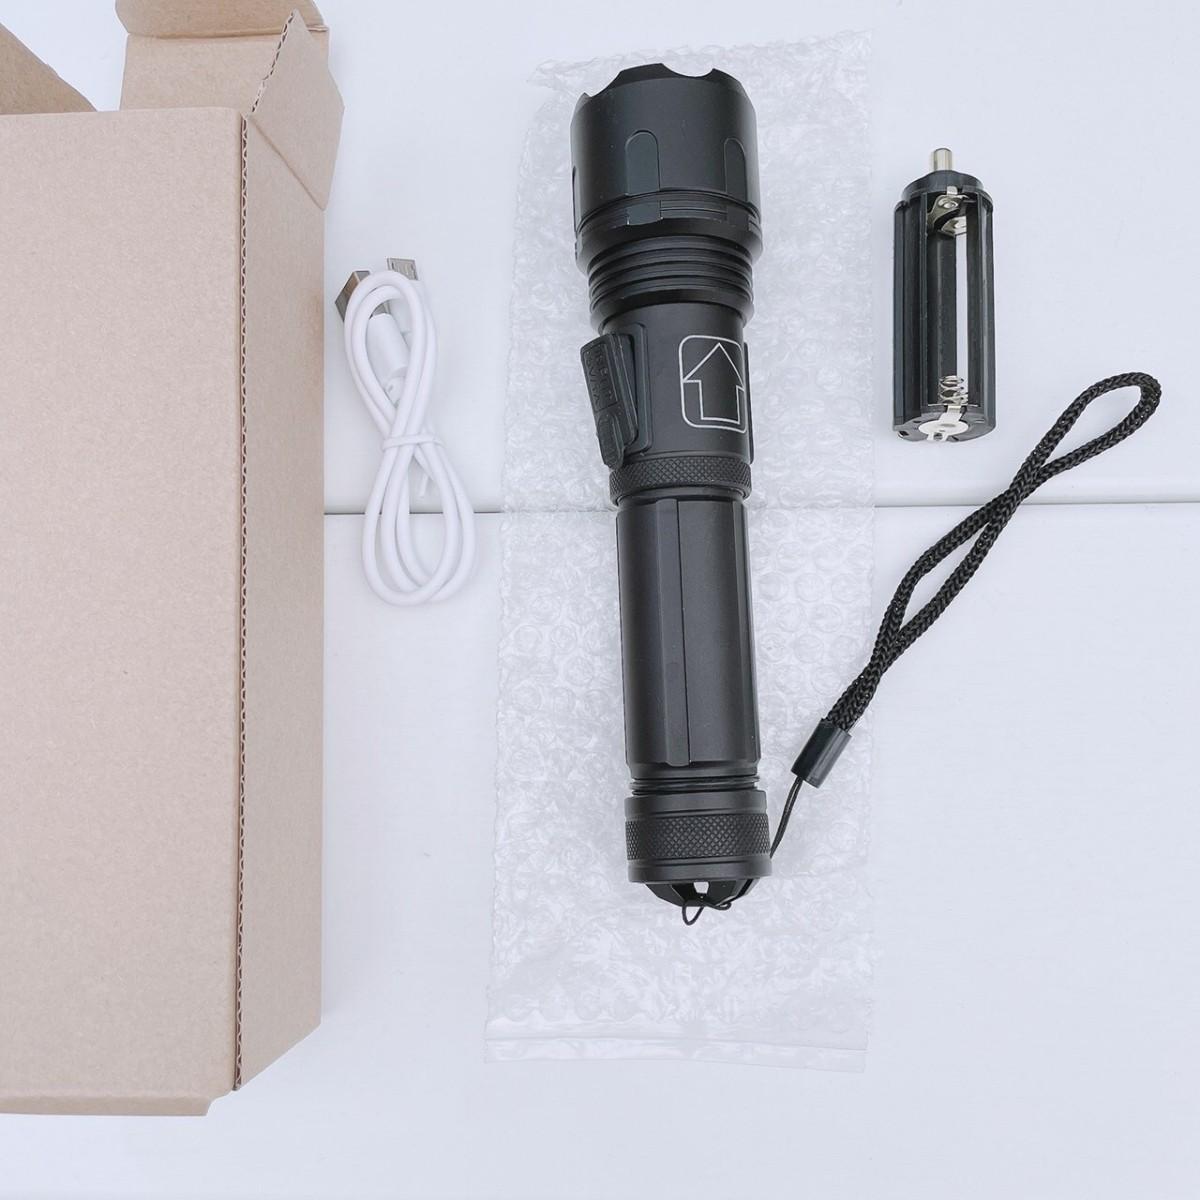 LED懐中電灯 アウトドア 夜釣り 電池式 USB接続可 非常用 防災用 父の日 懐中電灯 ハンディライト LEDライト USB